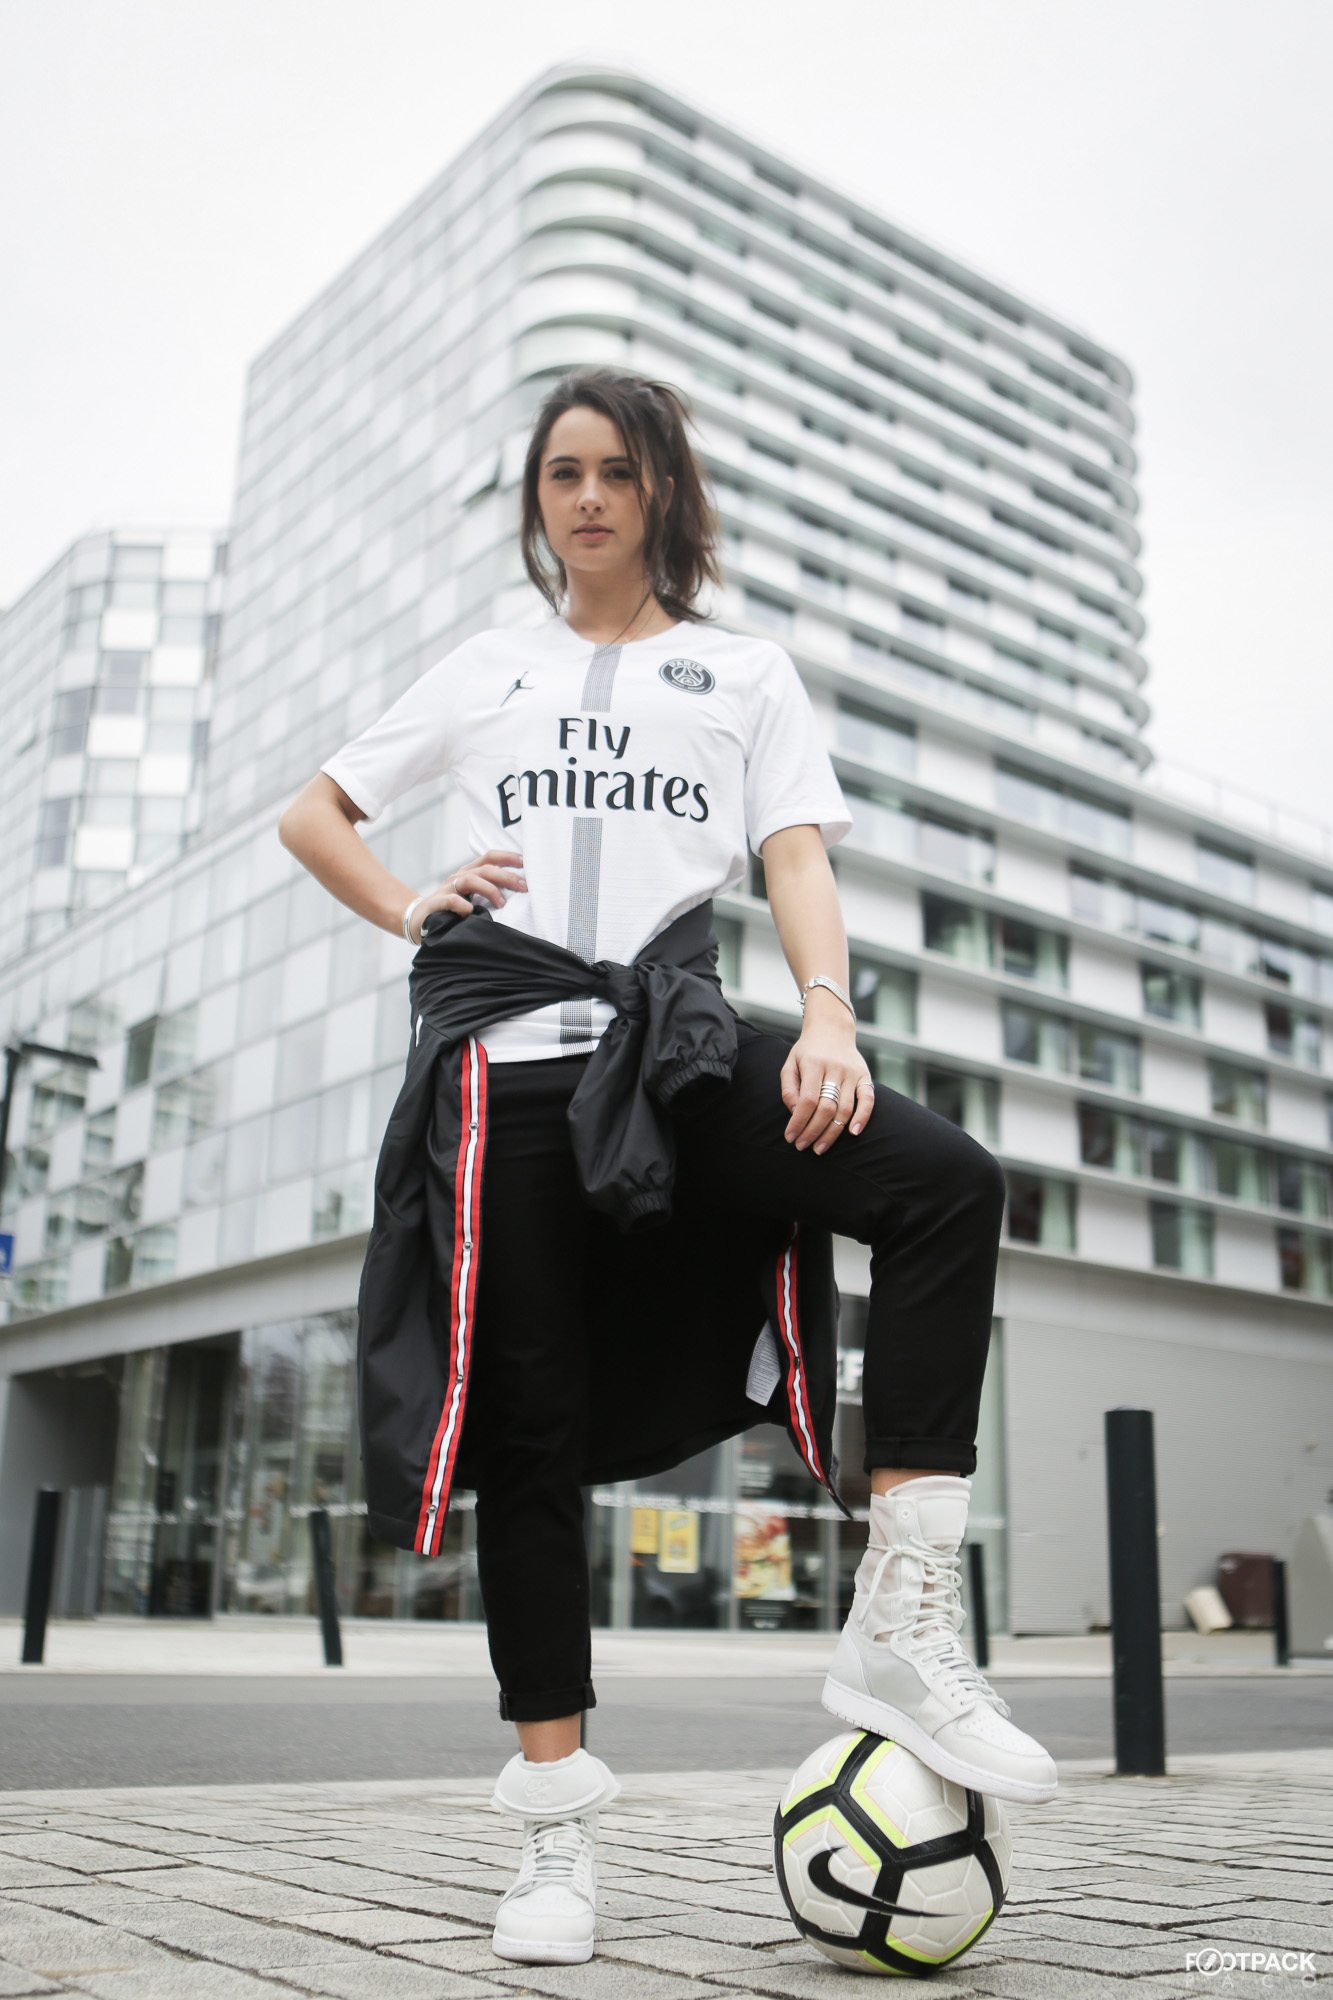 maillot-paris-saint-germain-jordan-2018-2019-footpack-4